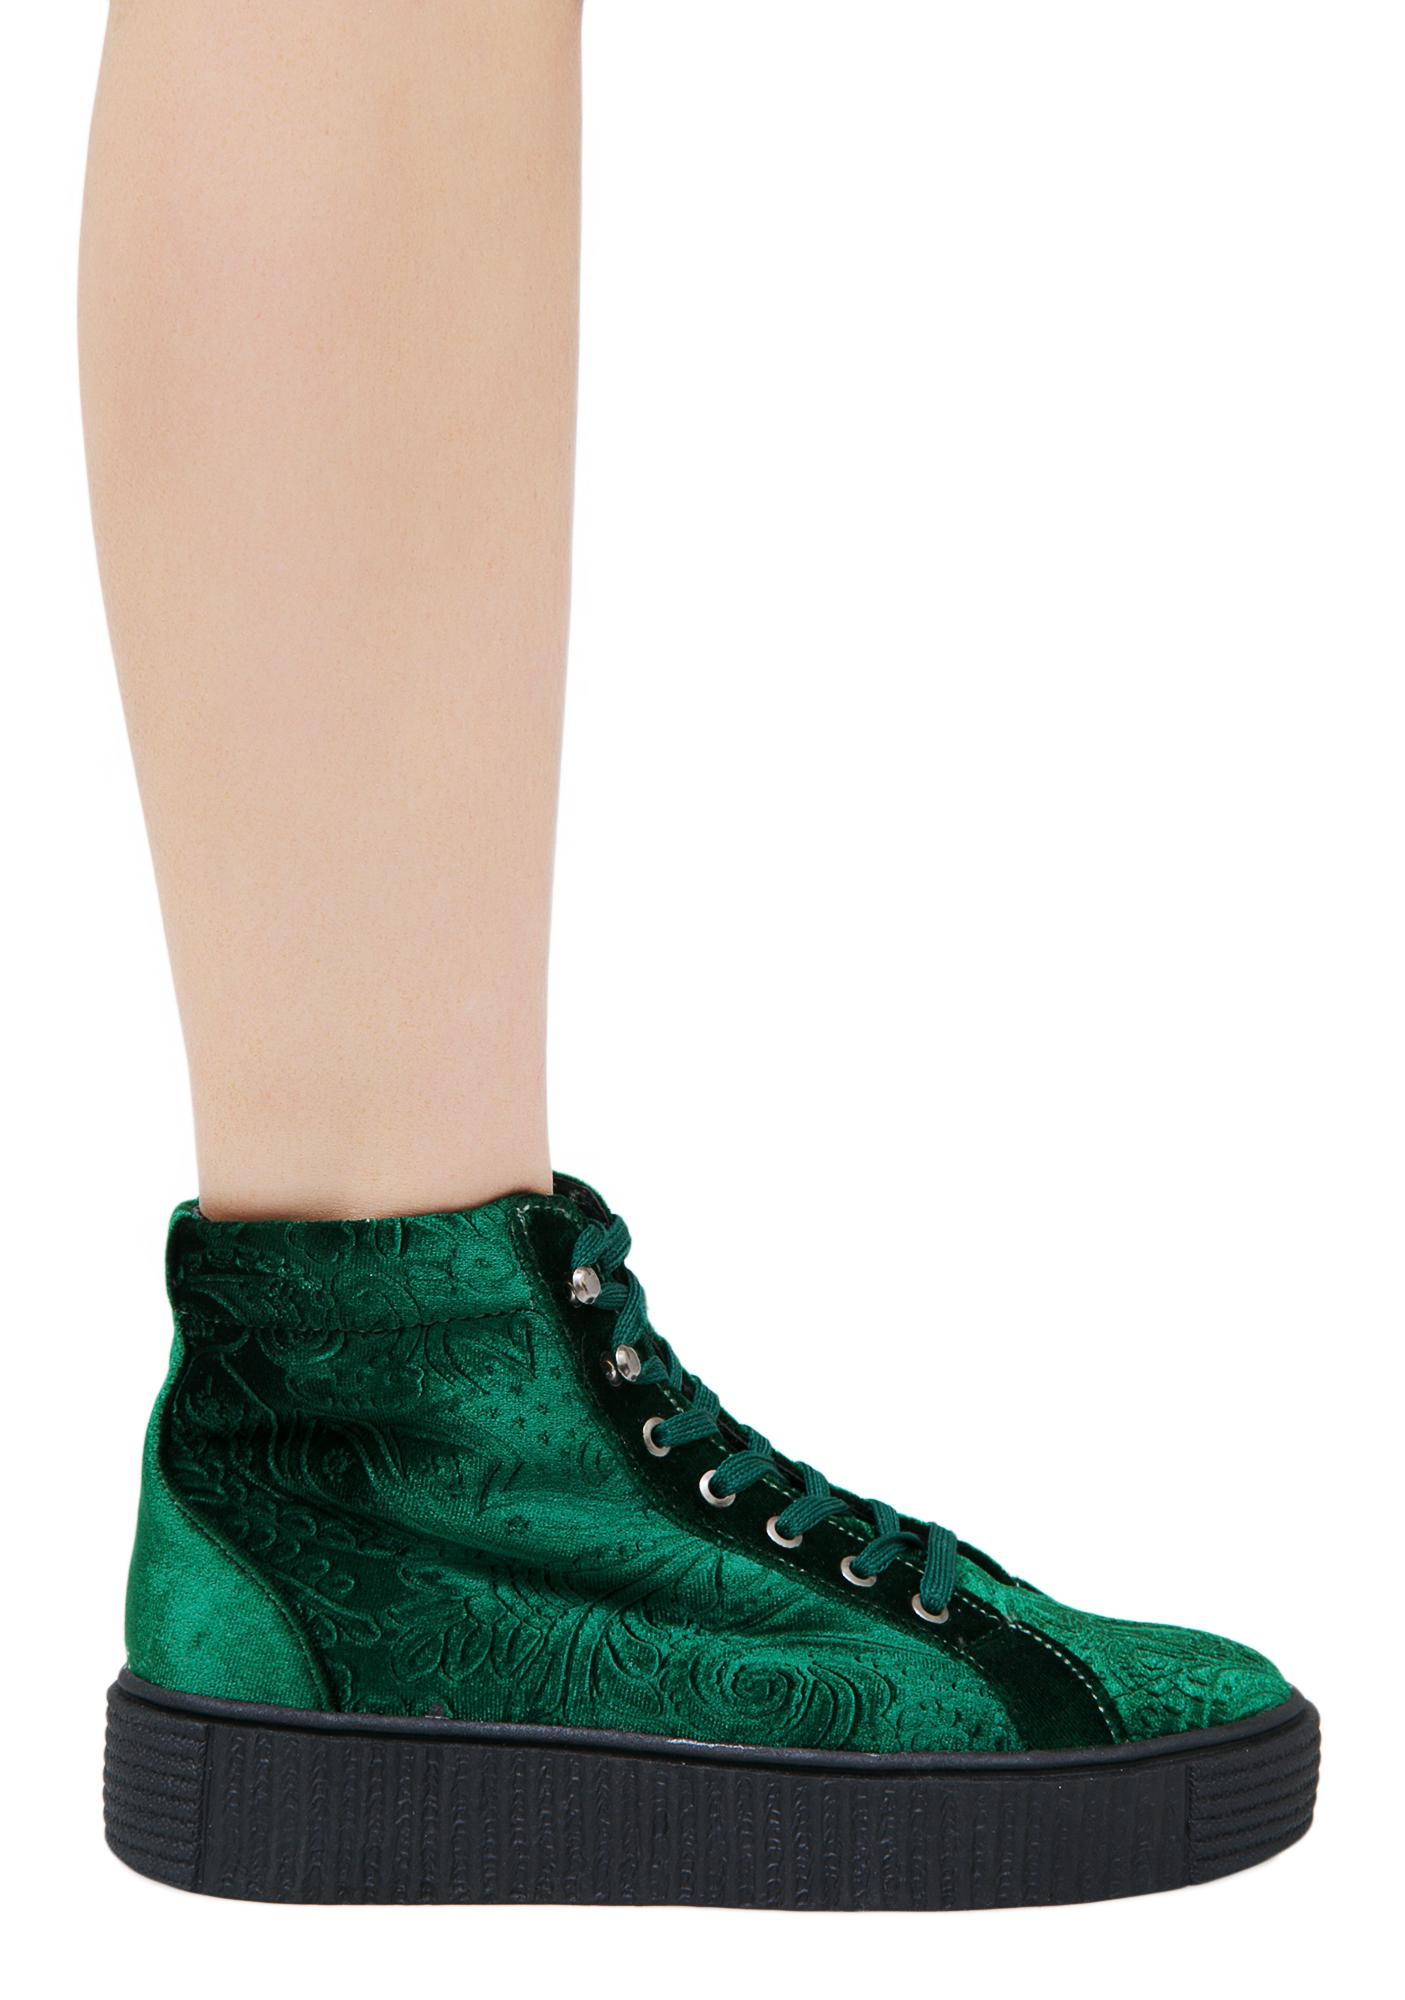 Emerald Move In Silence Velvet Creeper Sneakers